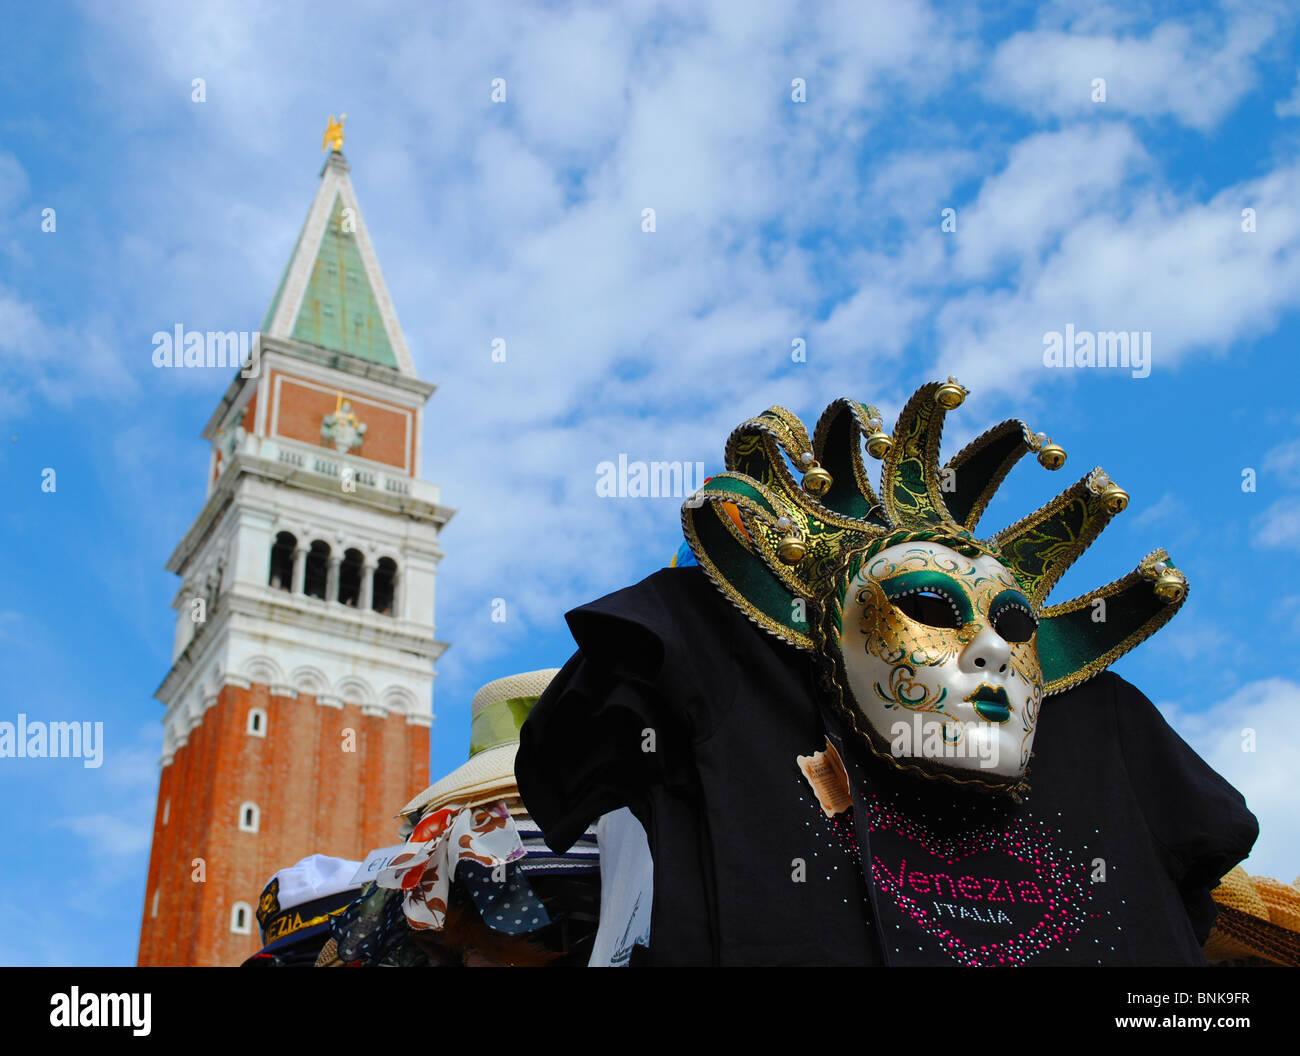 Maske und Bell tower in Markusplatz entfernt, Venedig, Italien Stockbild